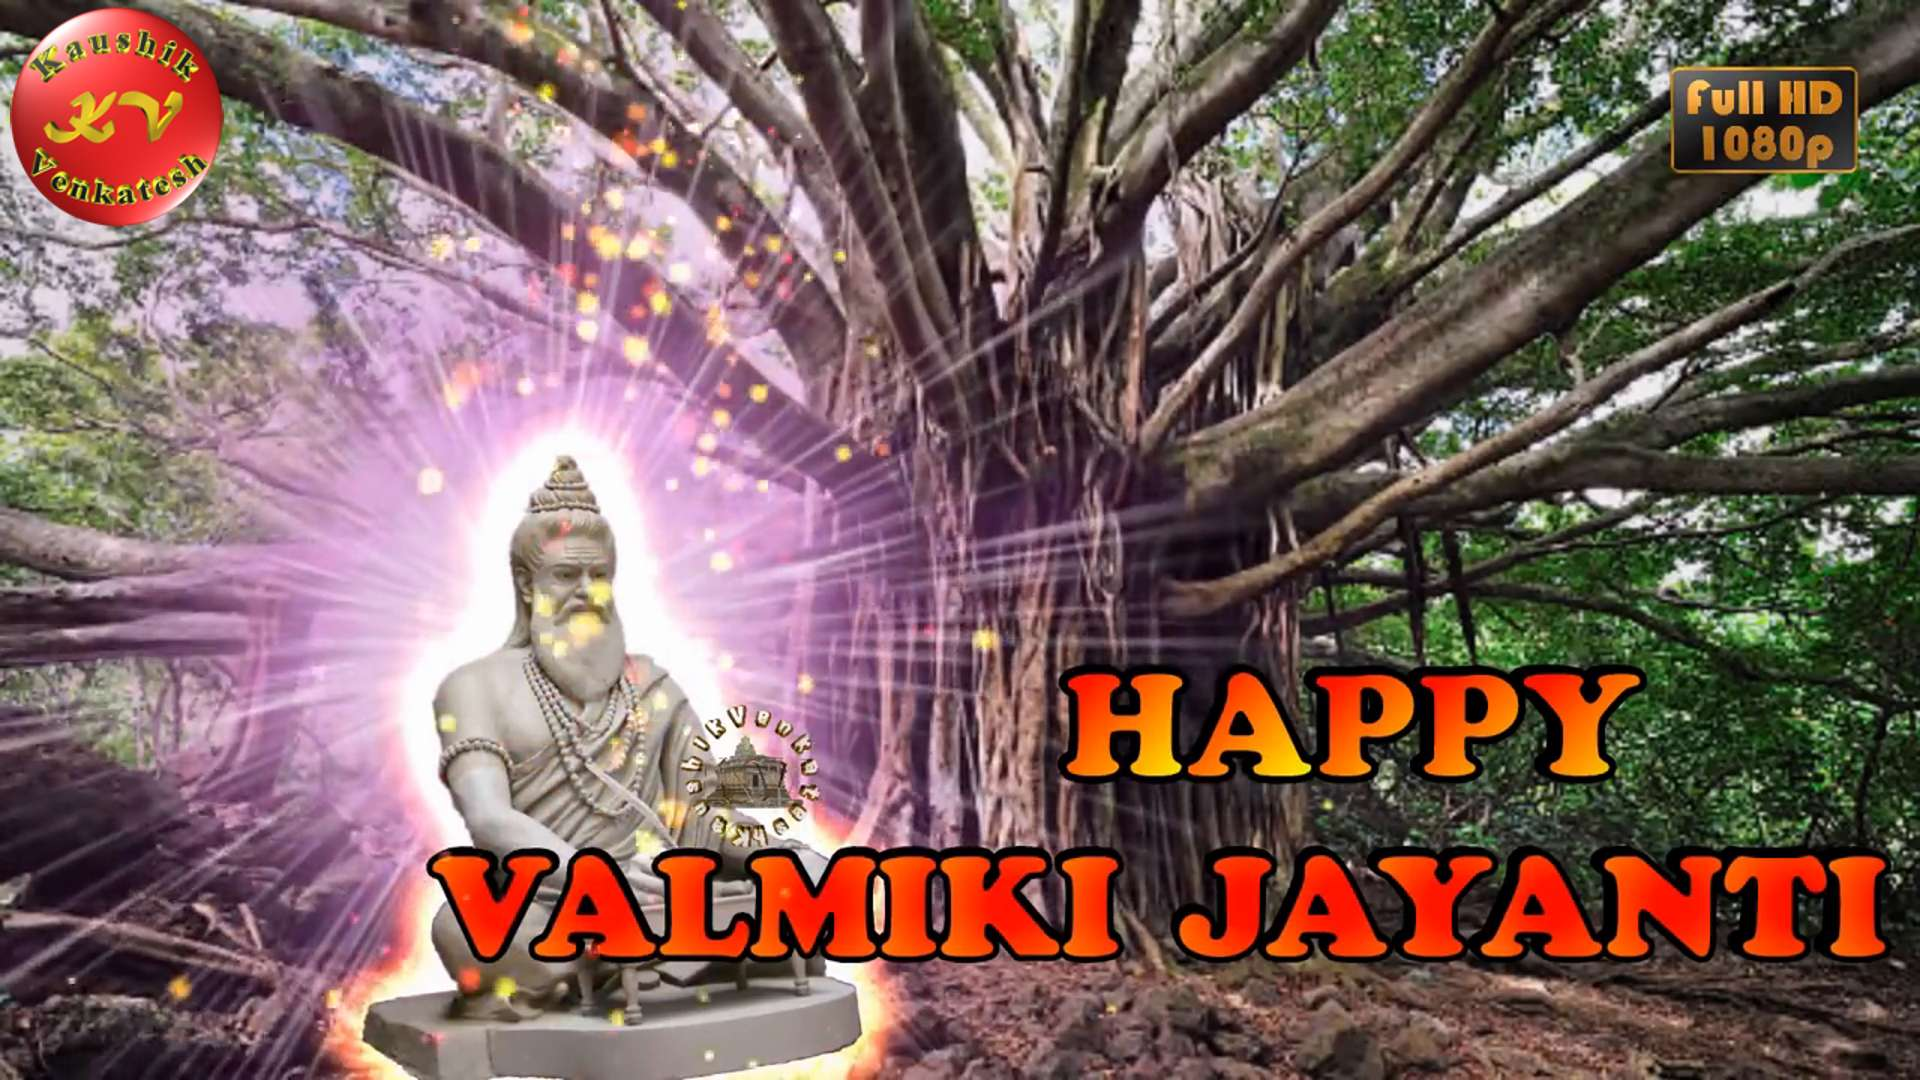 Greetings Image of Maharishi Valmiki Jayanti 2021